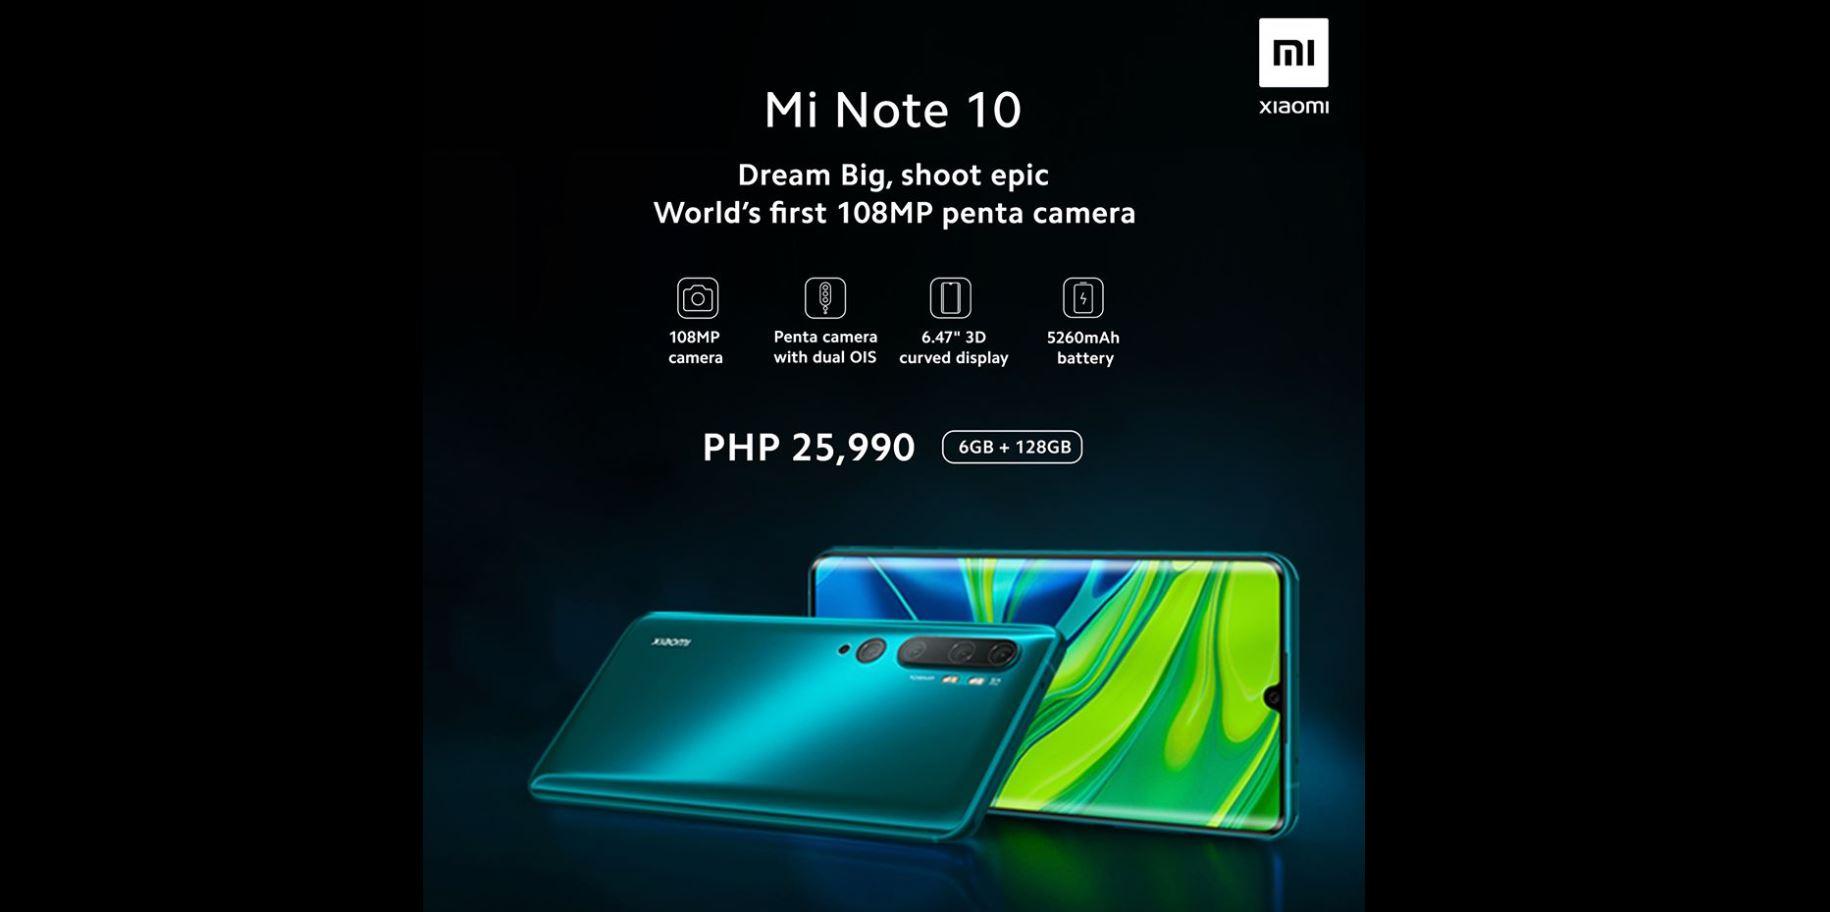 xiaomi-mi-note-10-official-price-specs-release-date-philippines